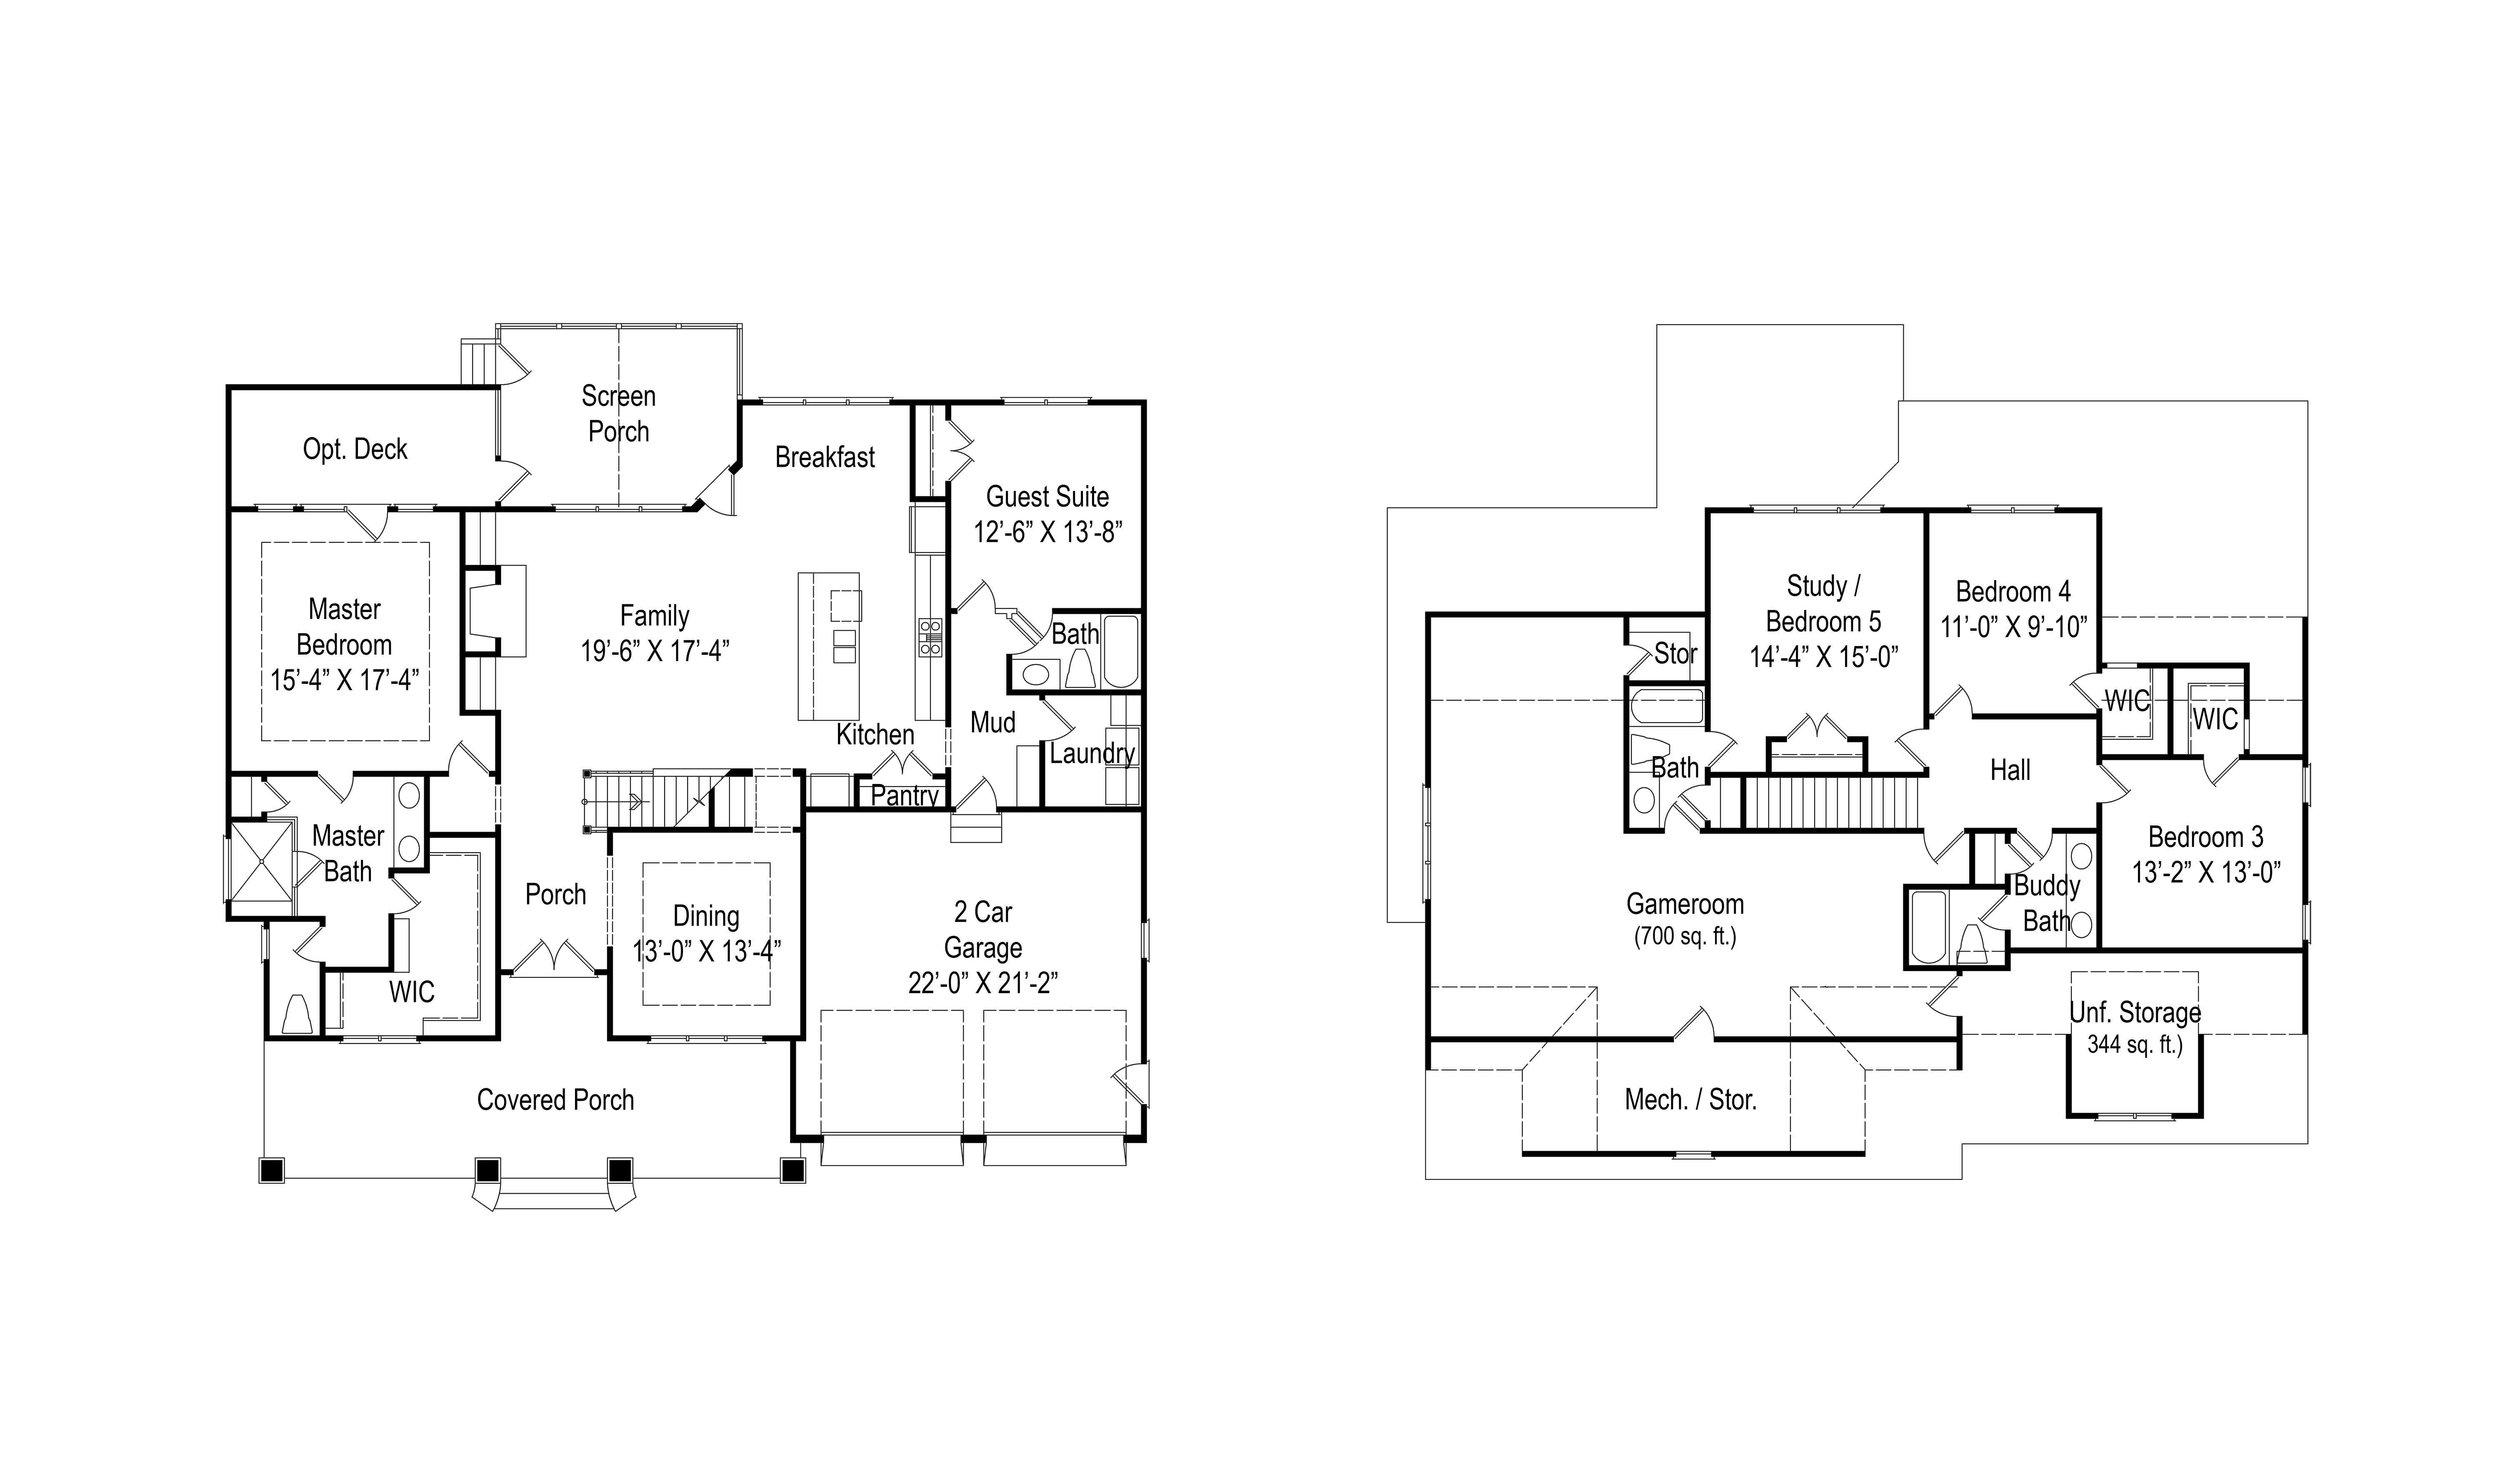 Lot 63 - Revised 8-8-19 - Floorplan - Woodward.jpg